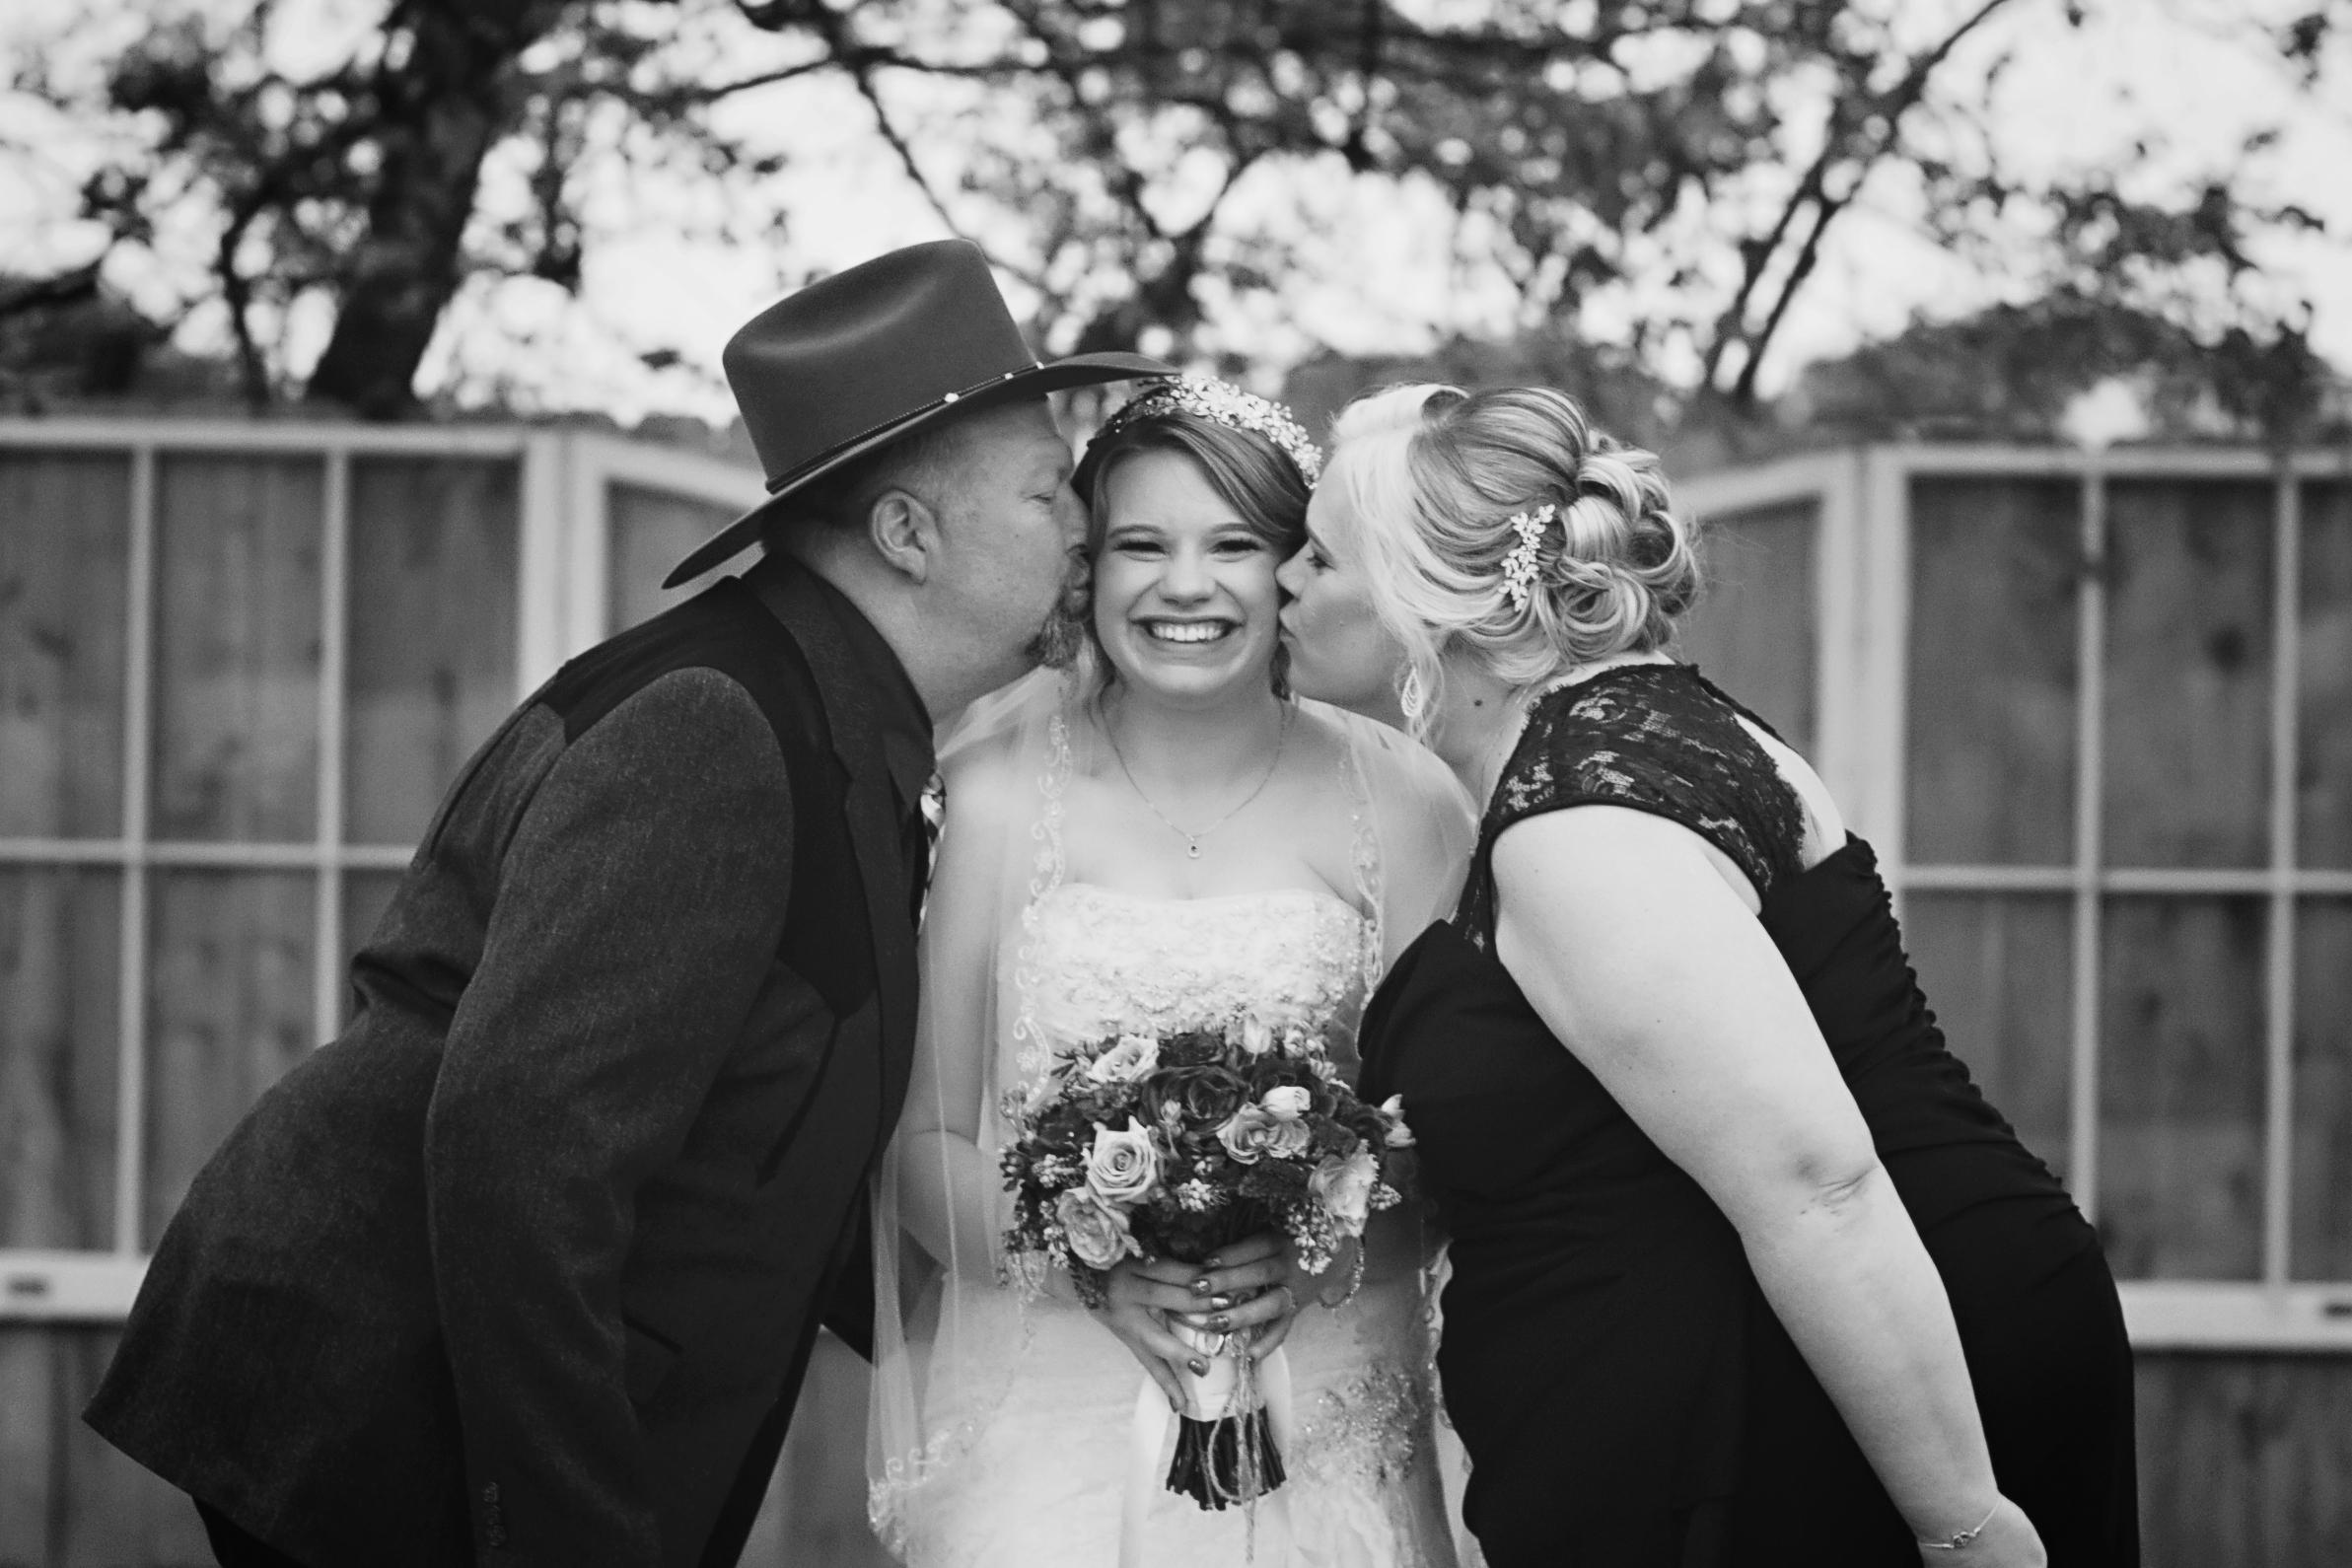 Weddings in Spring near Friendswood, Texas